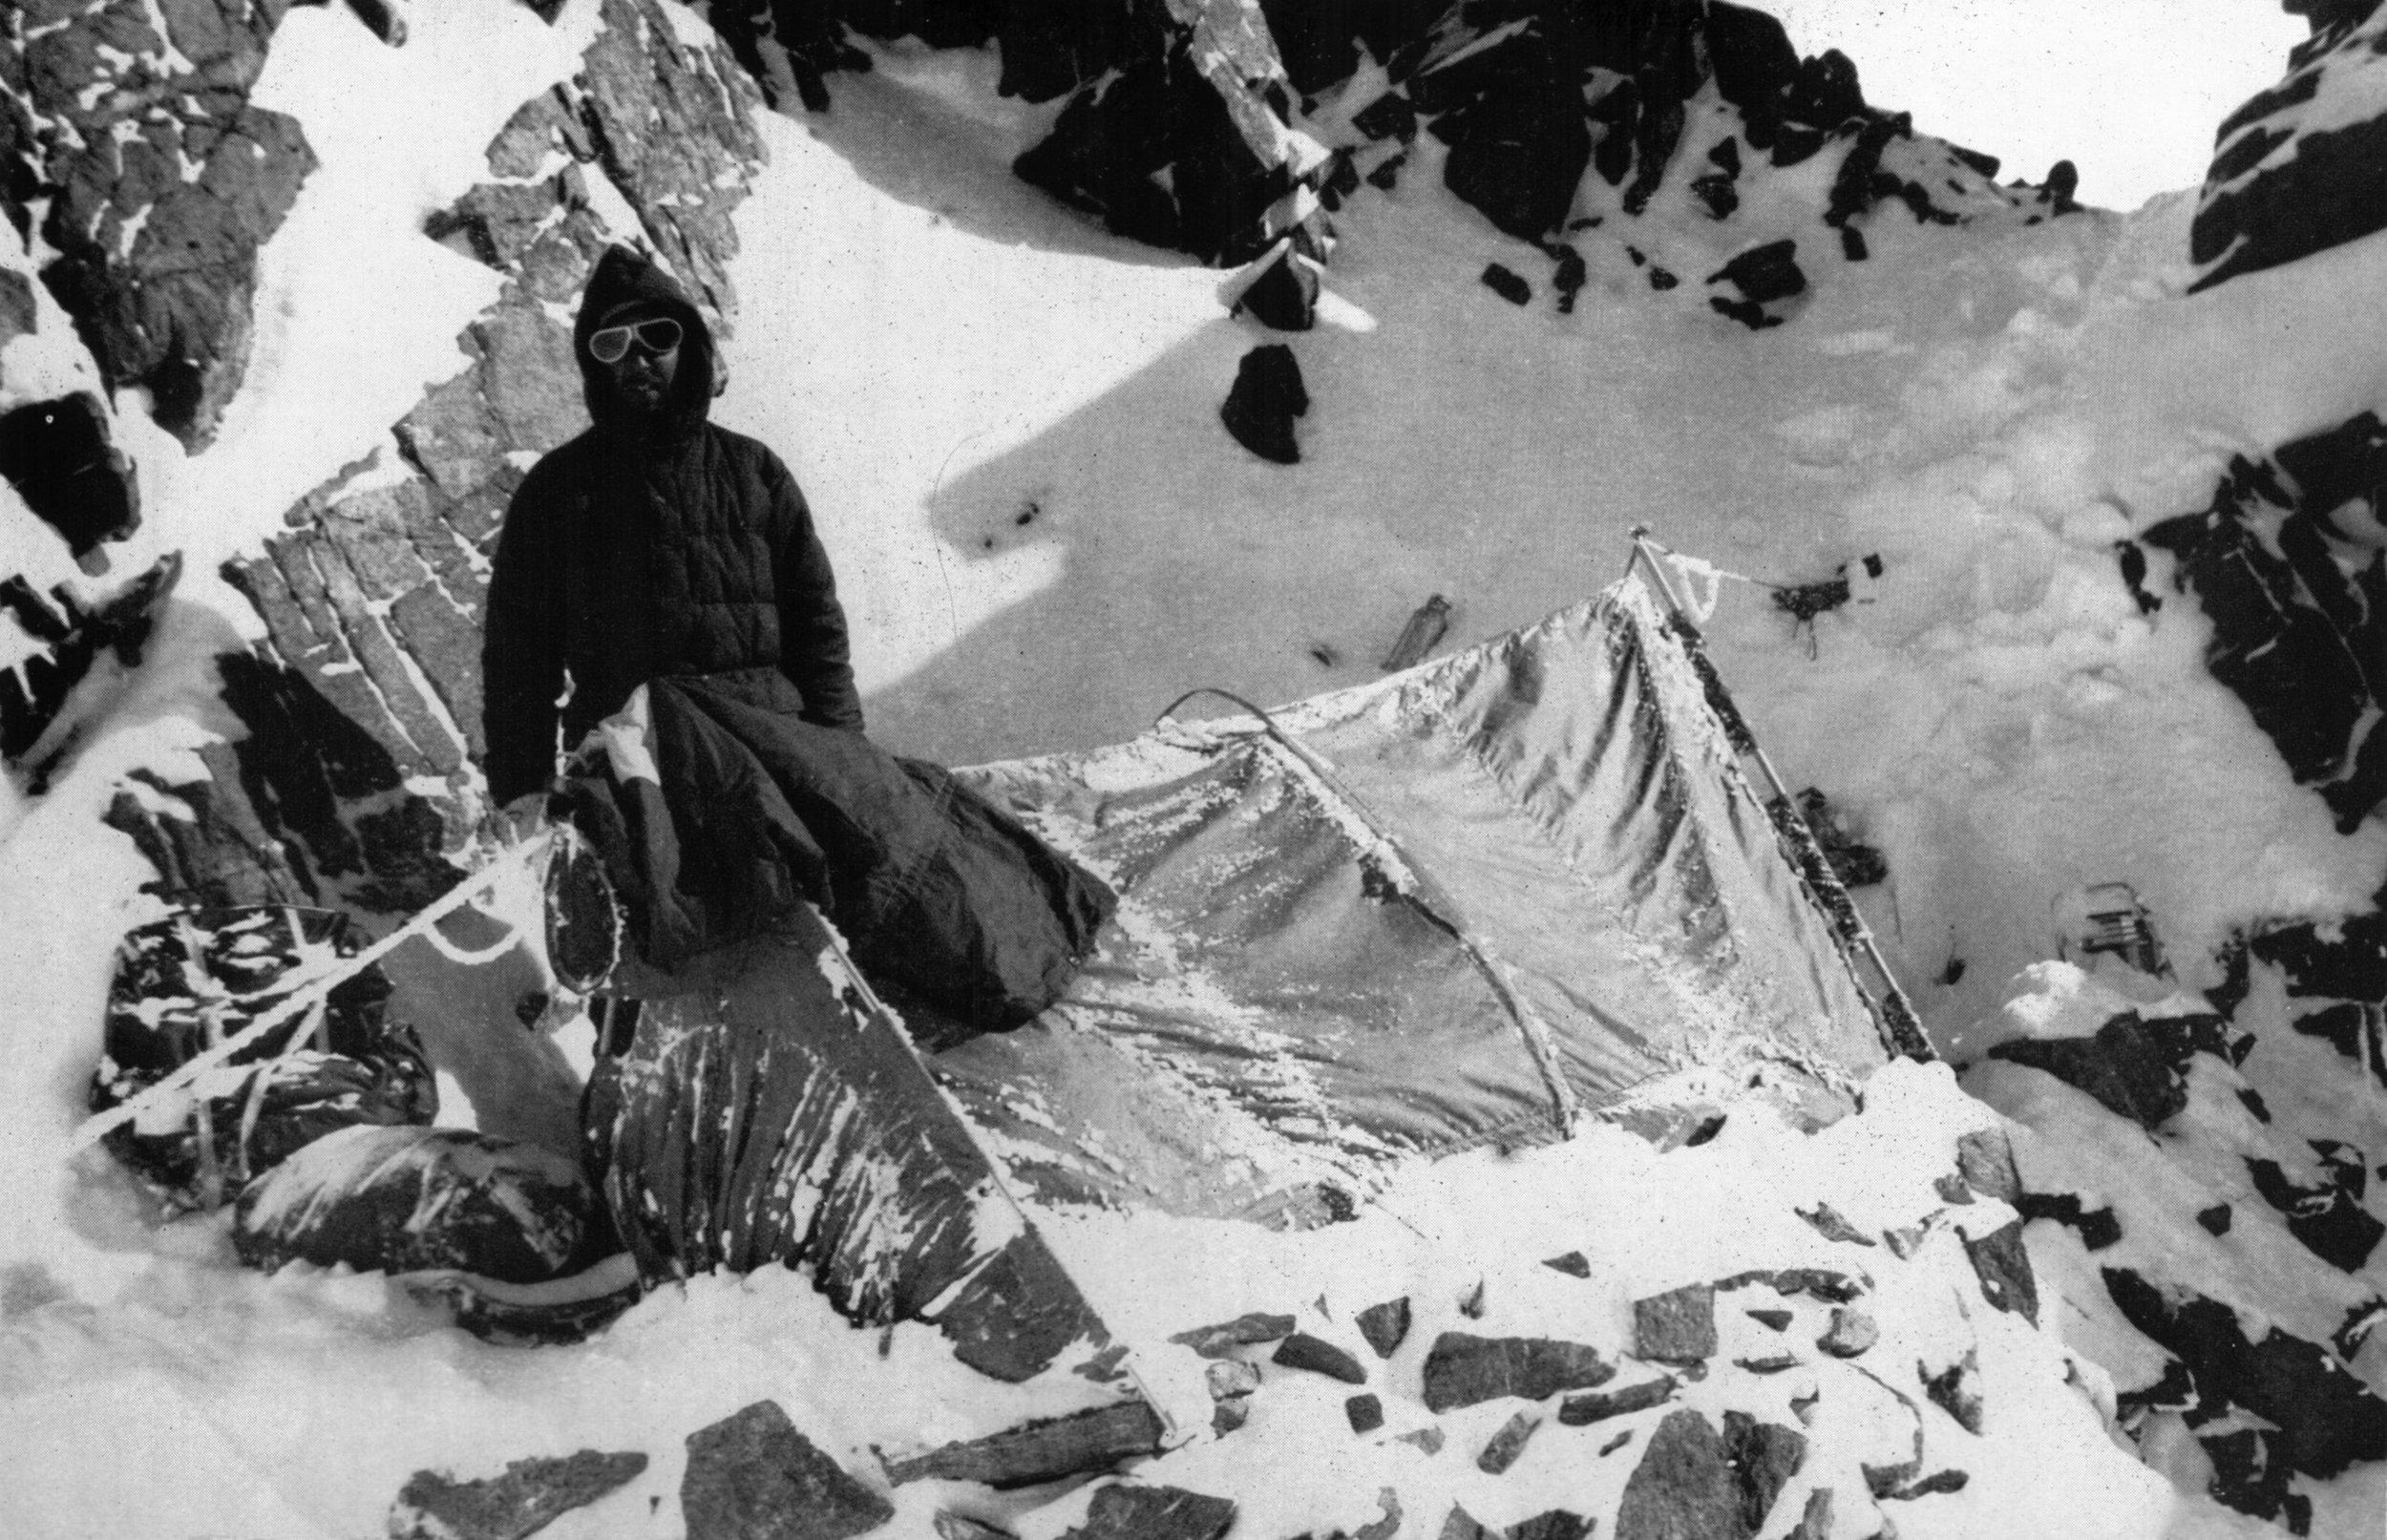 Capt. Streather at Camp III.  Photo, Third American Karakoram Expedition